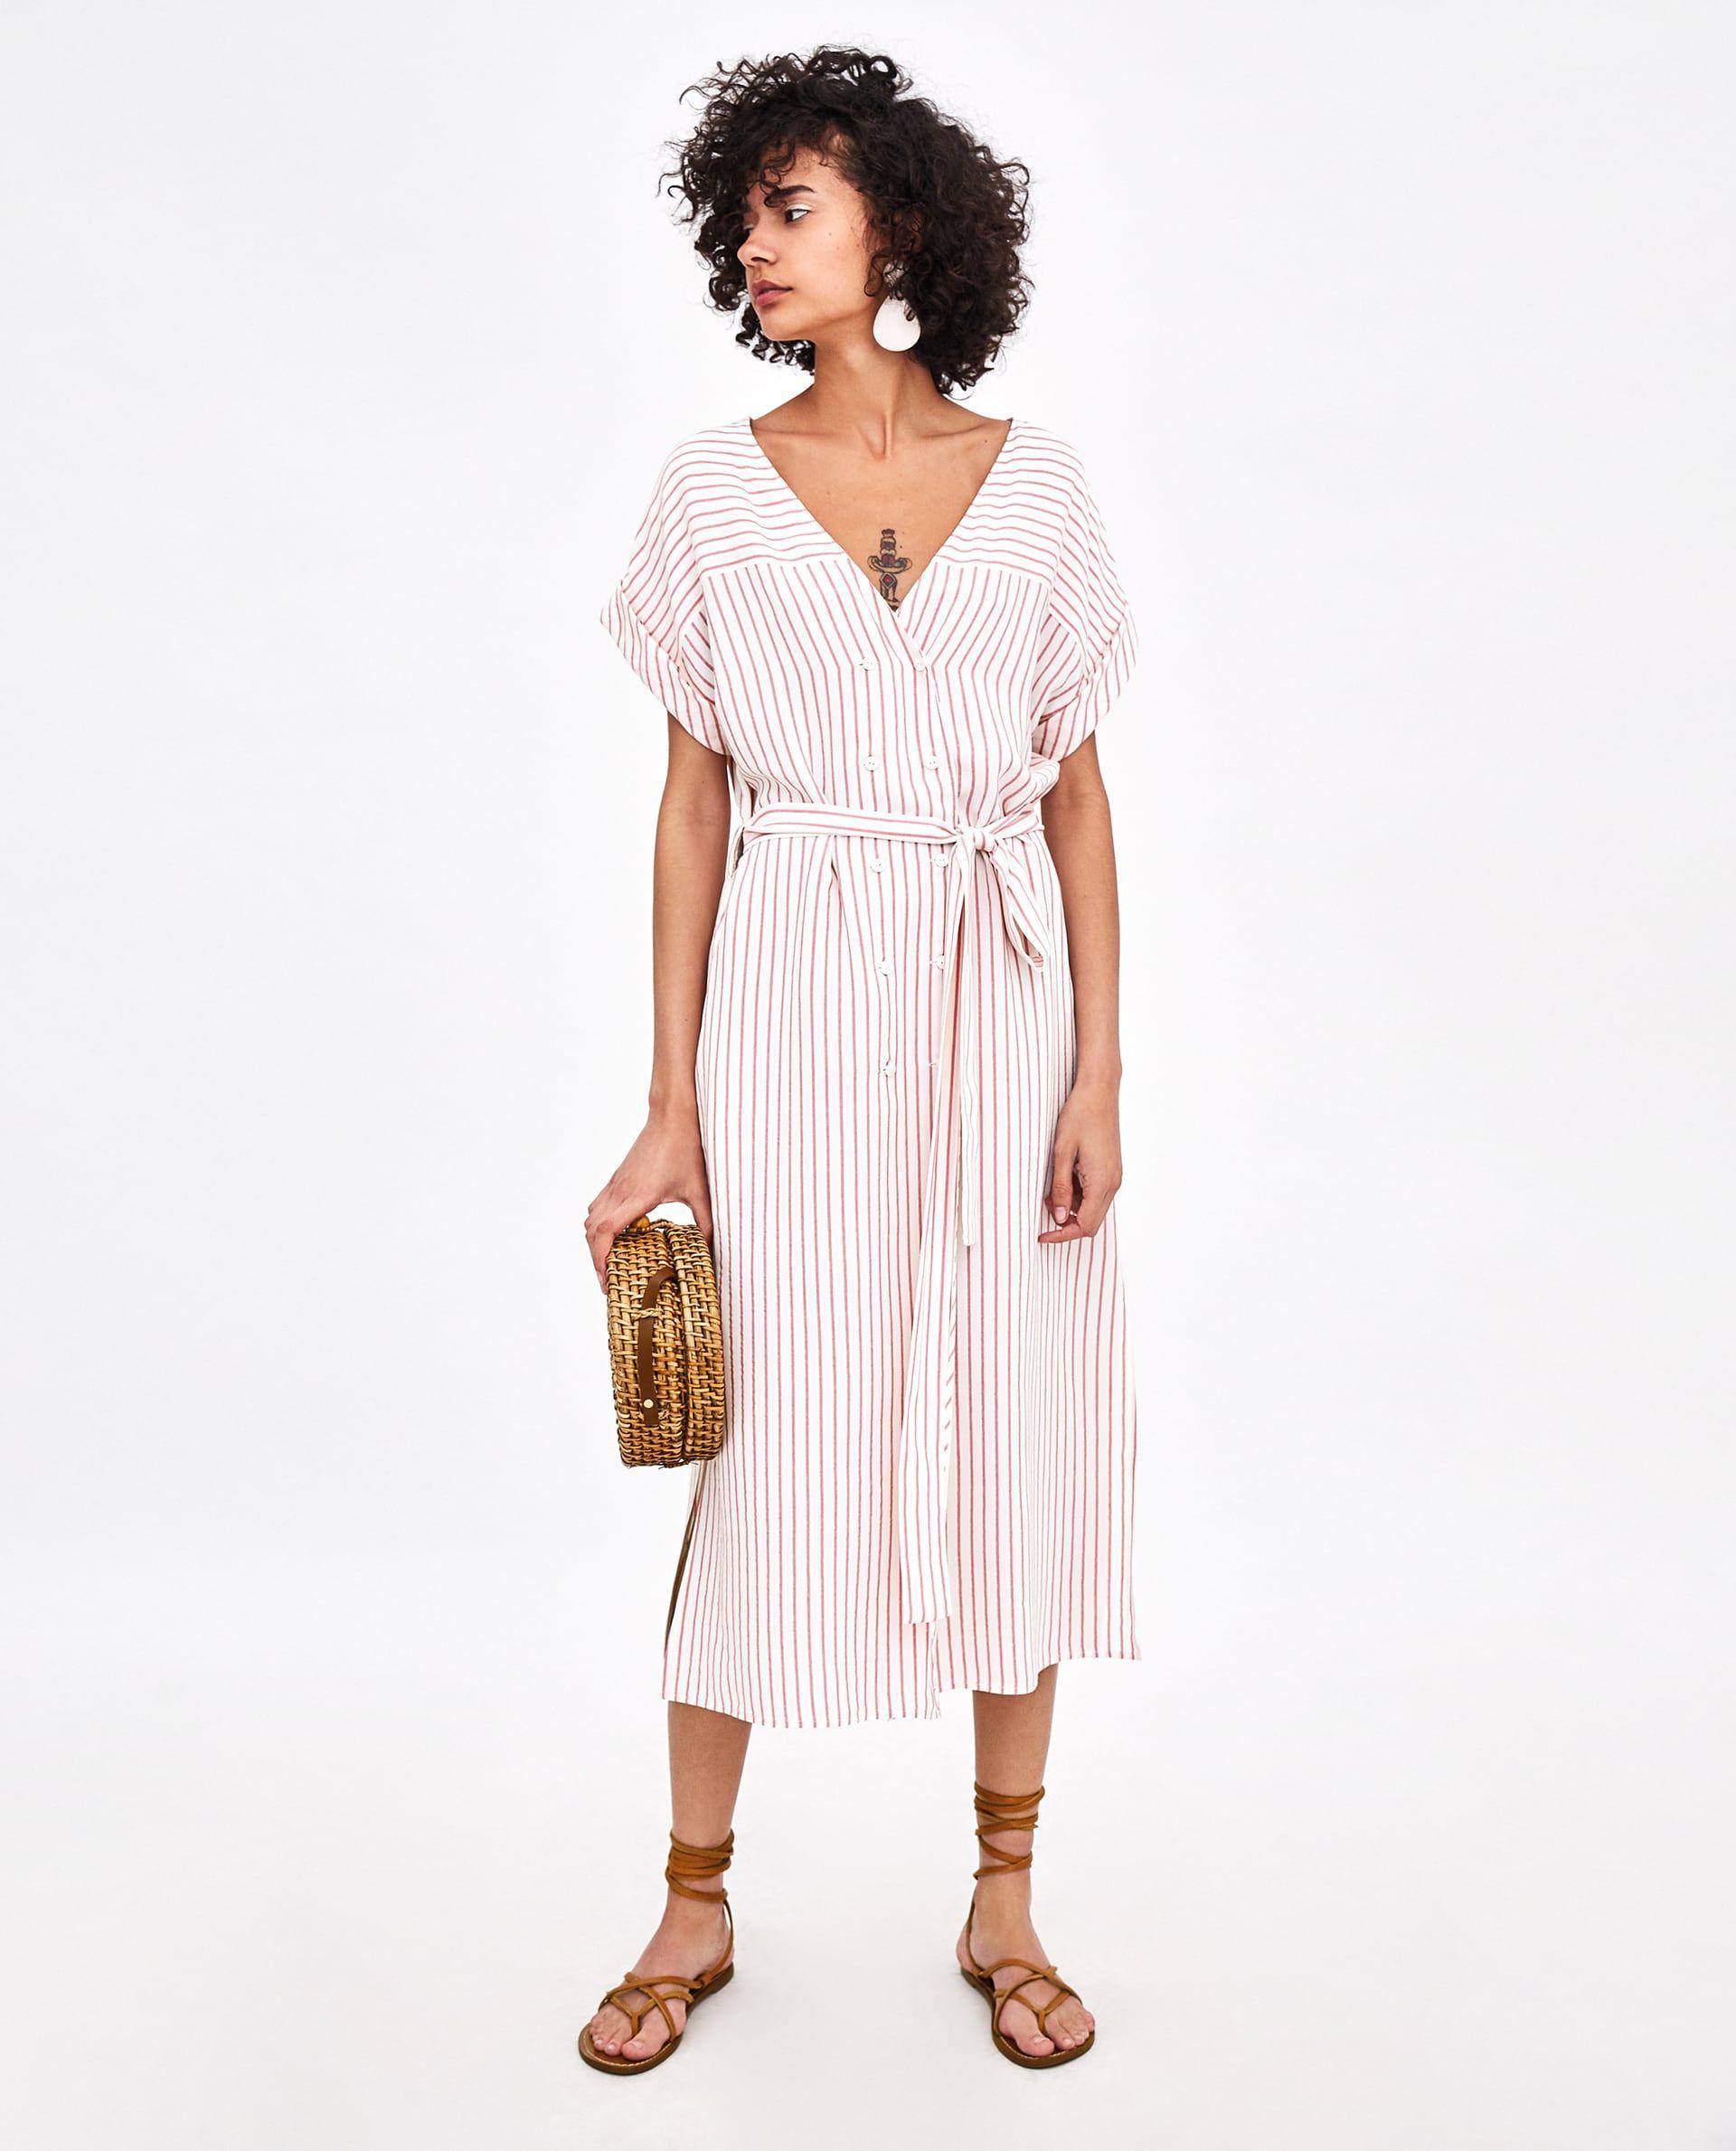 Vestido Midi Rayas Shirtkleid Sommerkleid Legere Kleider